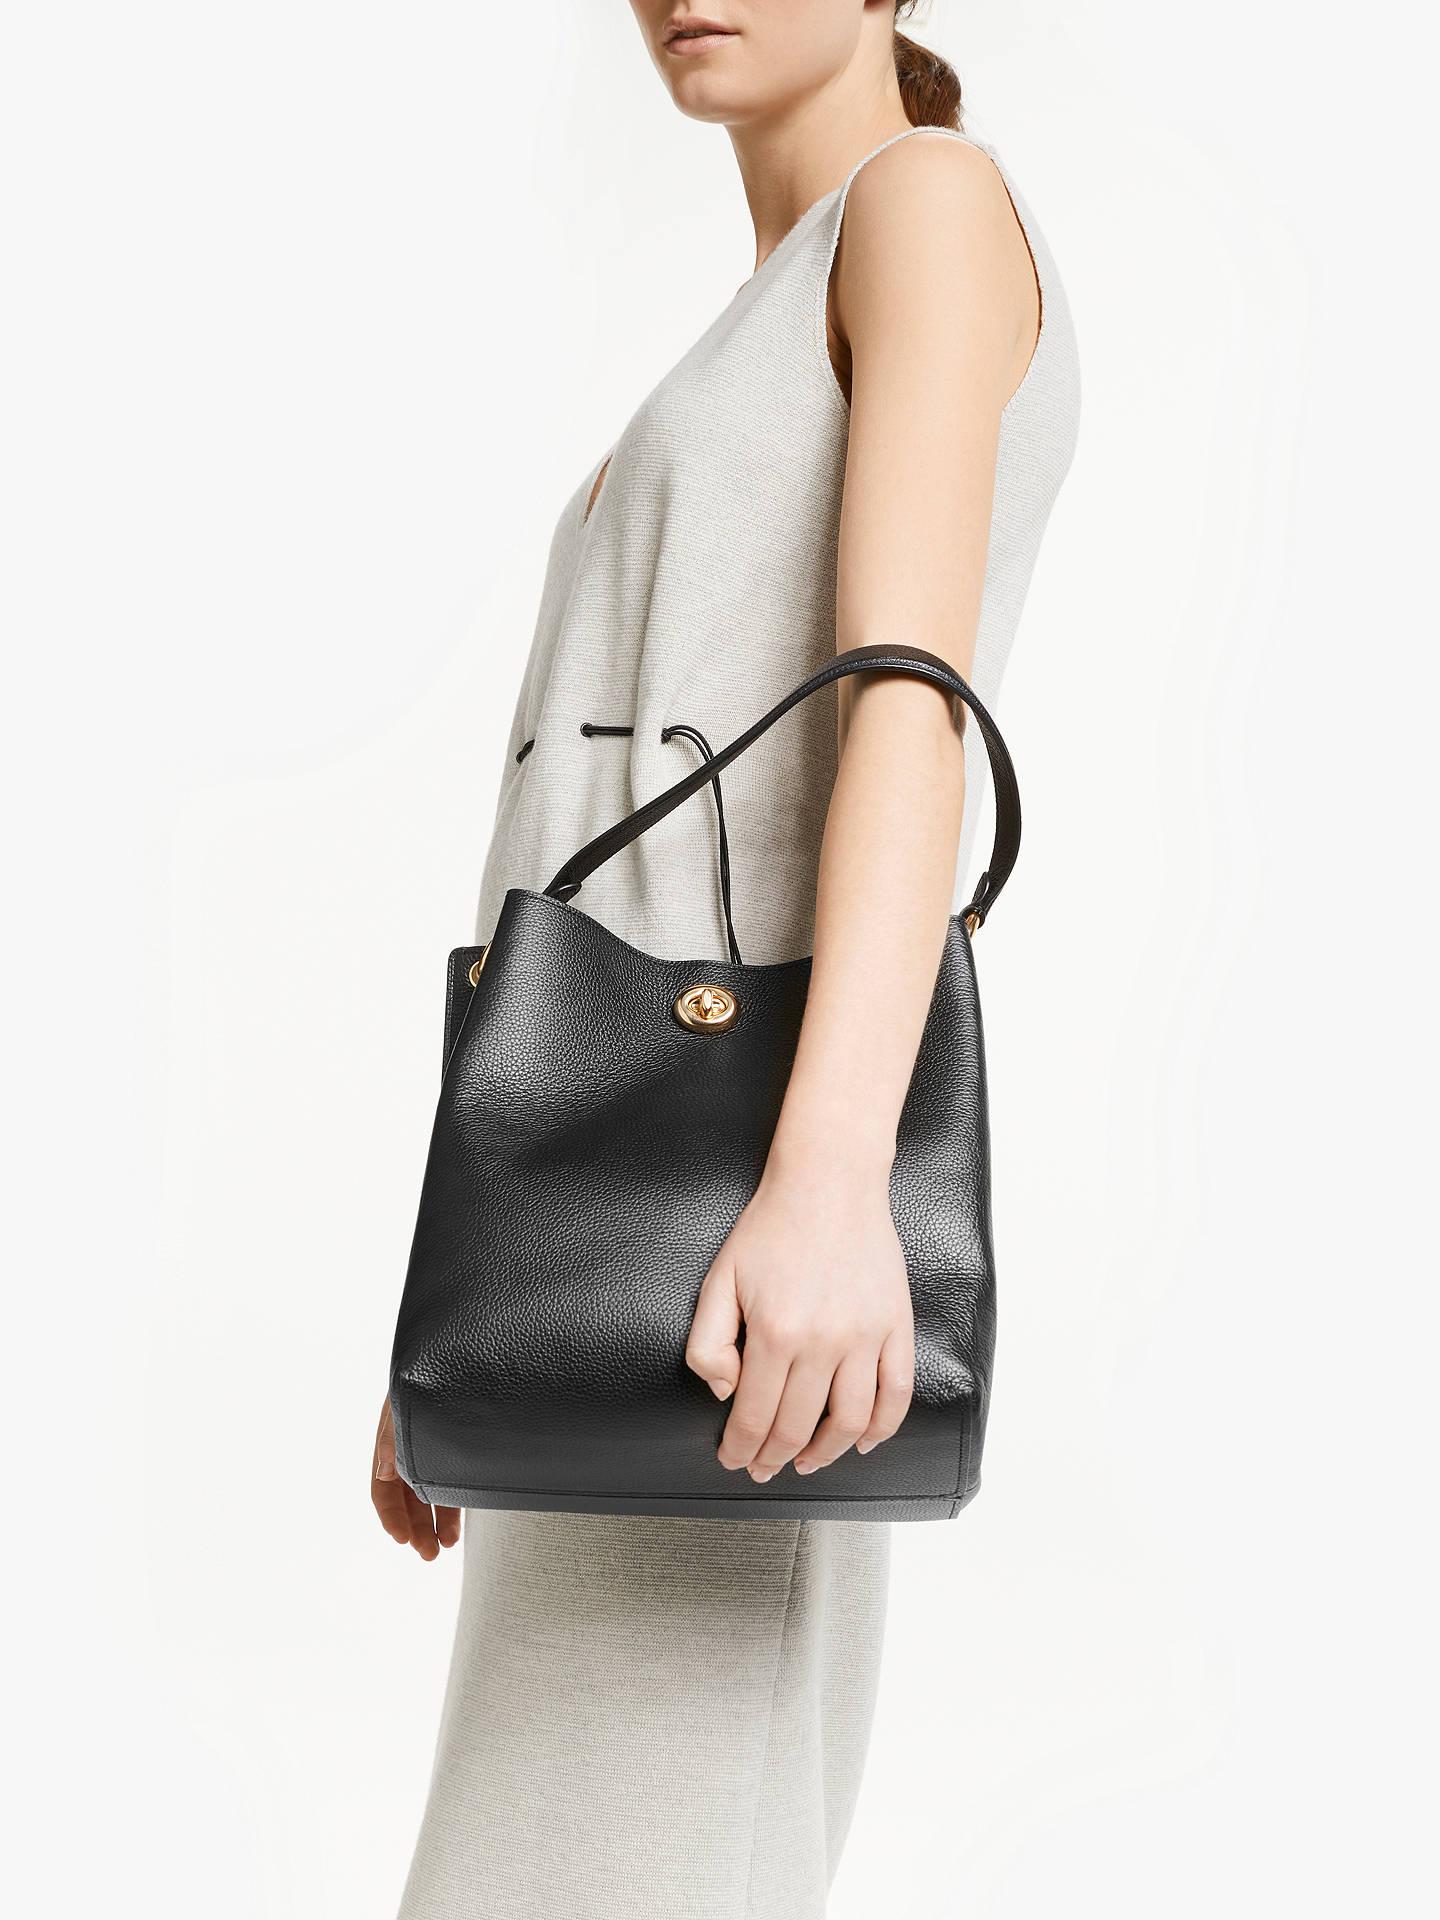 63672def26e65 ... Buy Coach Charlie Leather Bucket Bag, Black Online at johnlewis.com ...